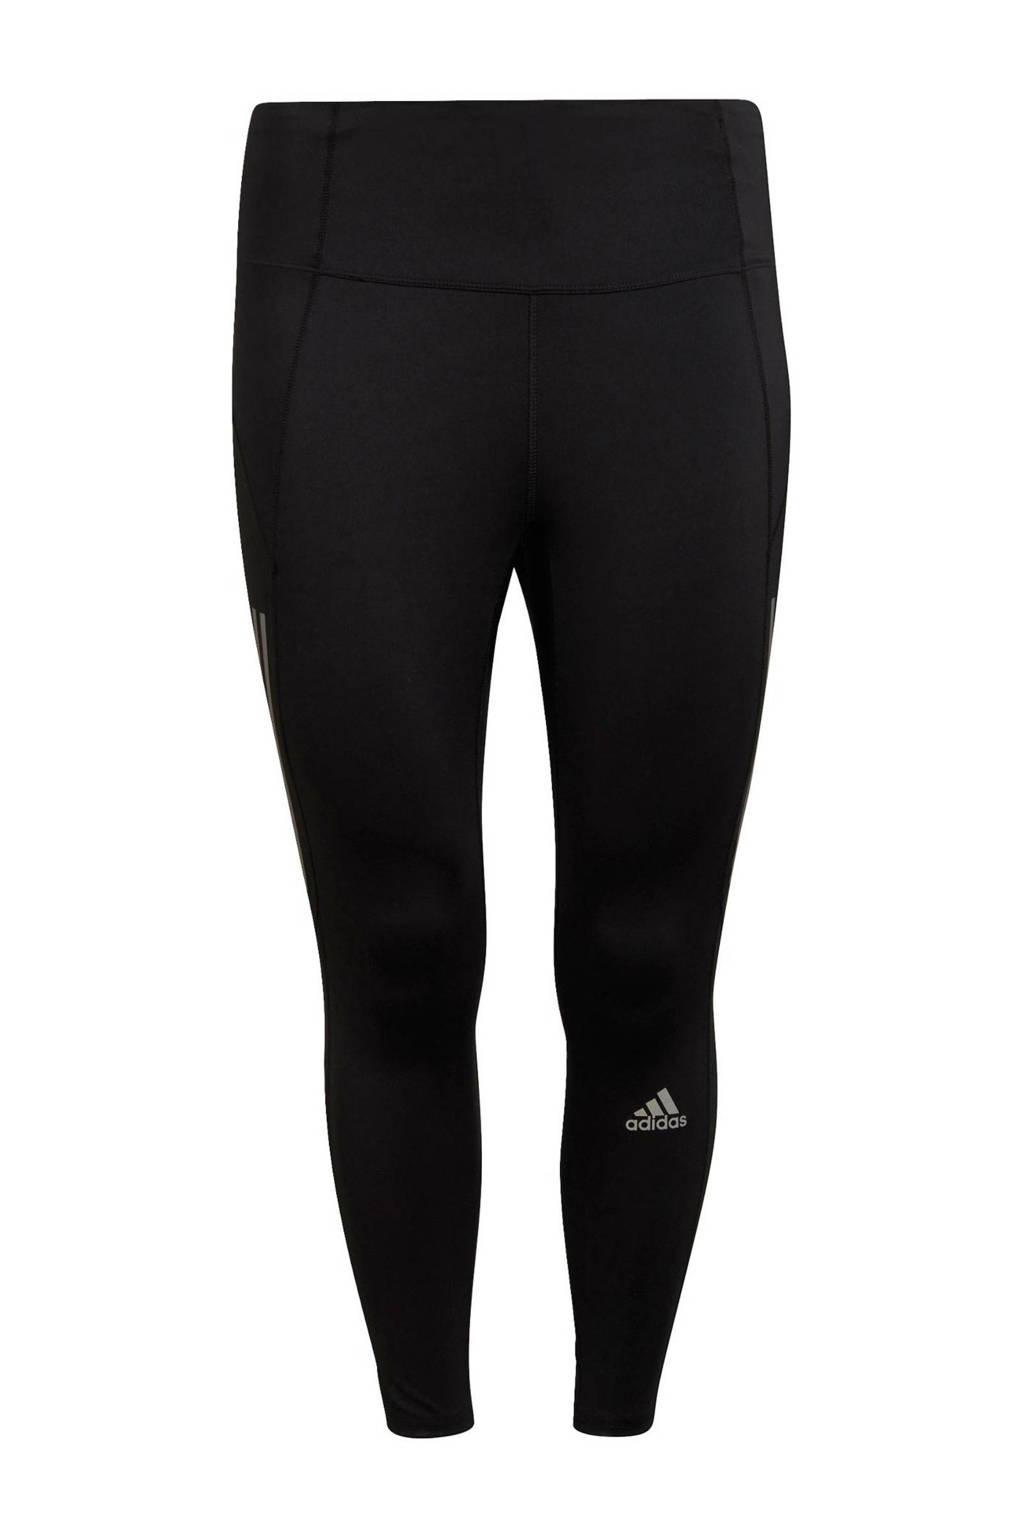 adidas Performance Own The Run Plus Size hardloop broek zwart, Zwart